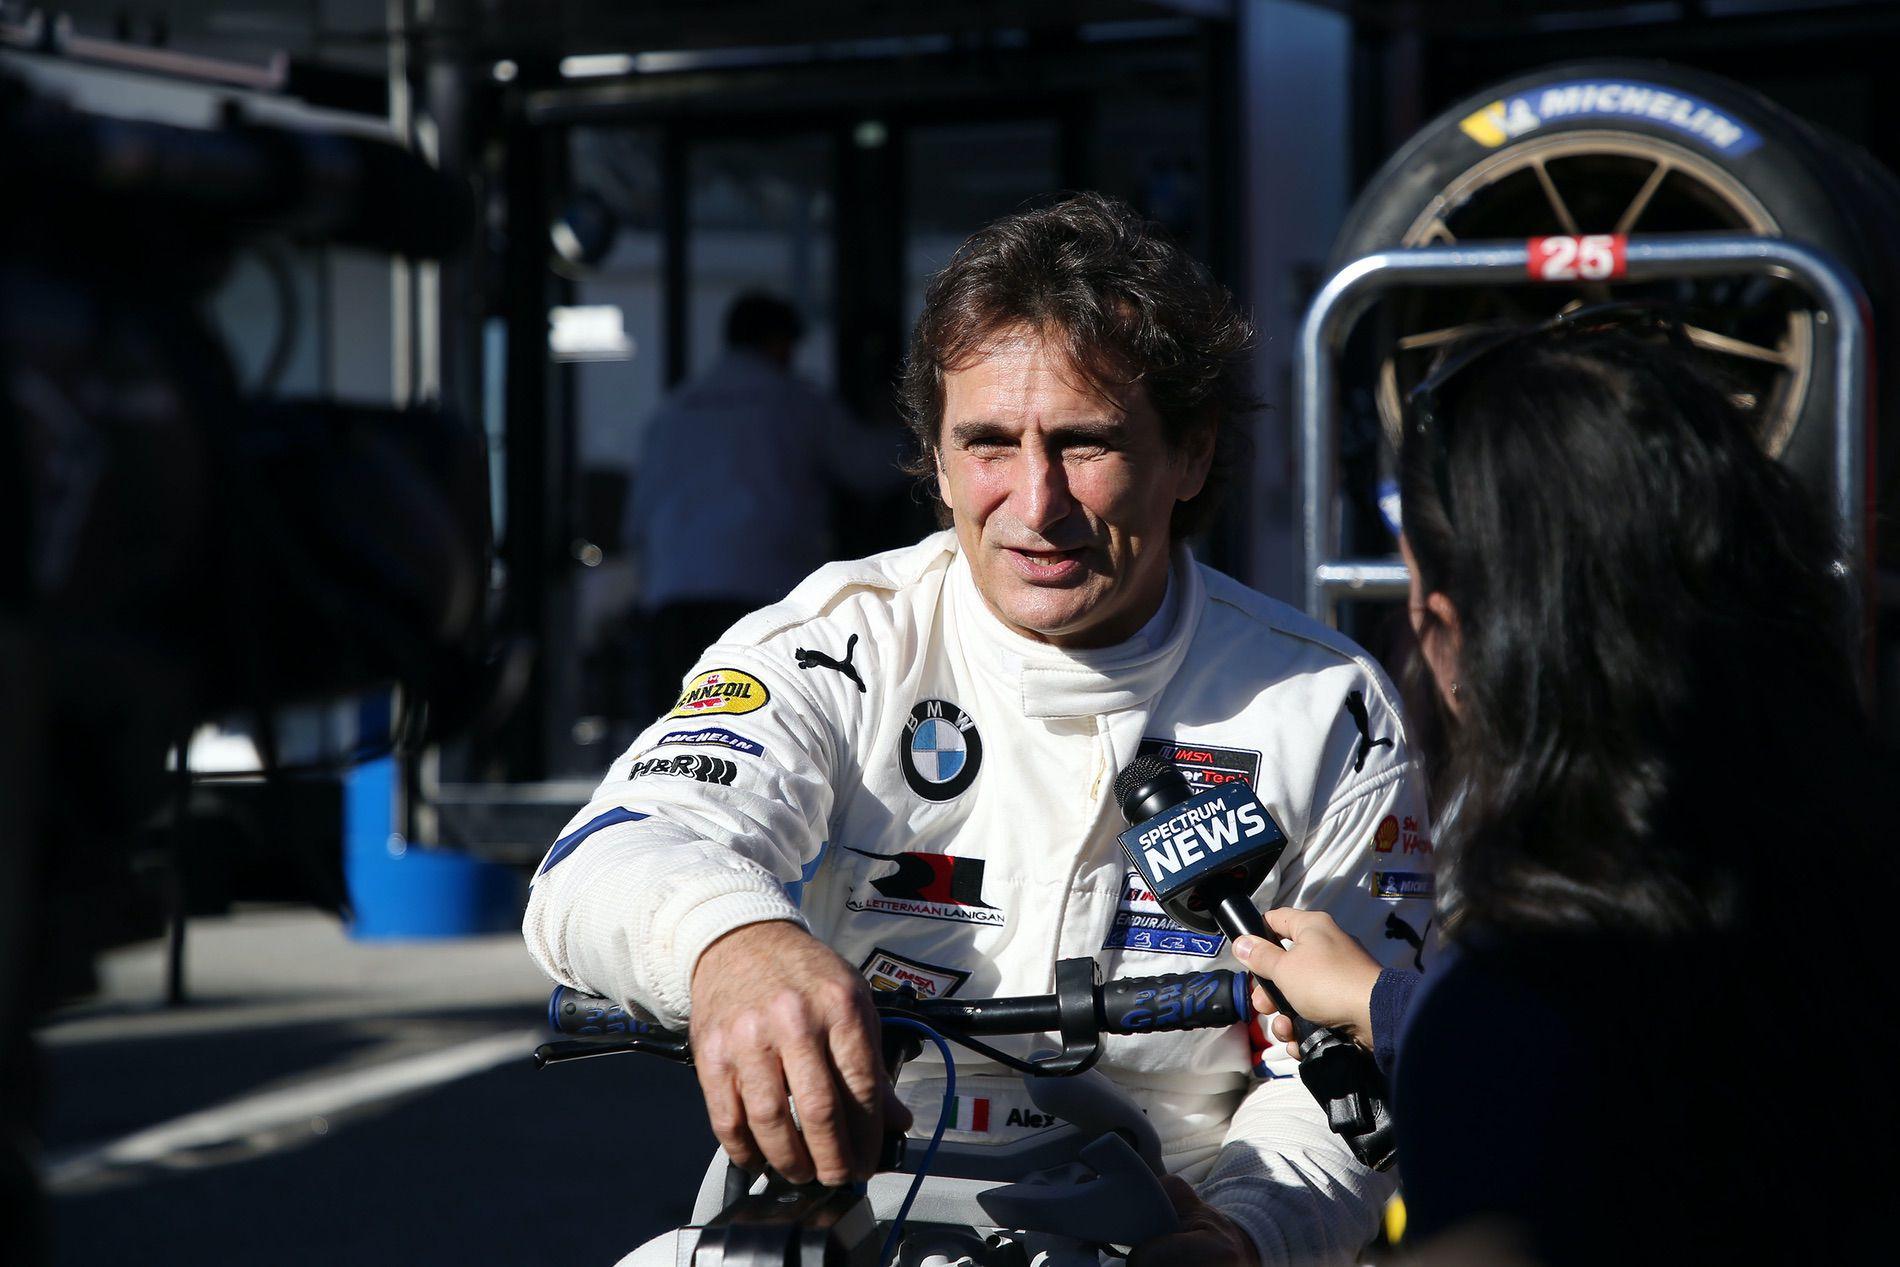 Alex Zanardi Daytona 04